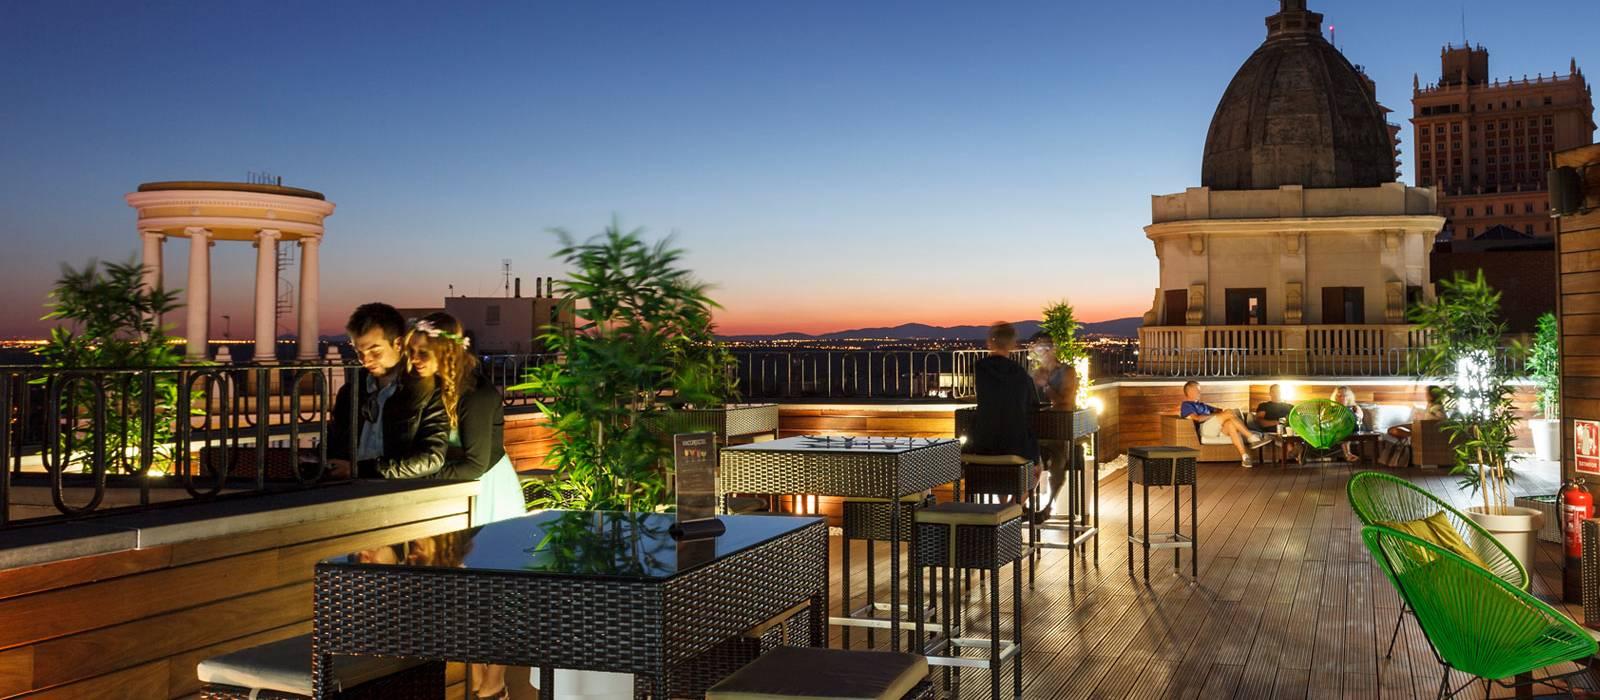 Hoteles con terraza en madrid vincci v a 66 for Casa de granada terraza madrid